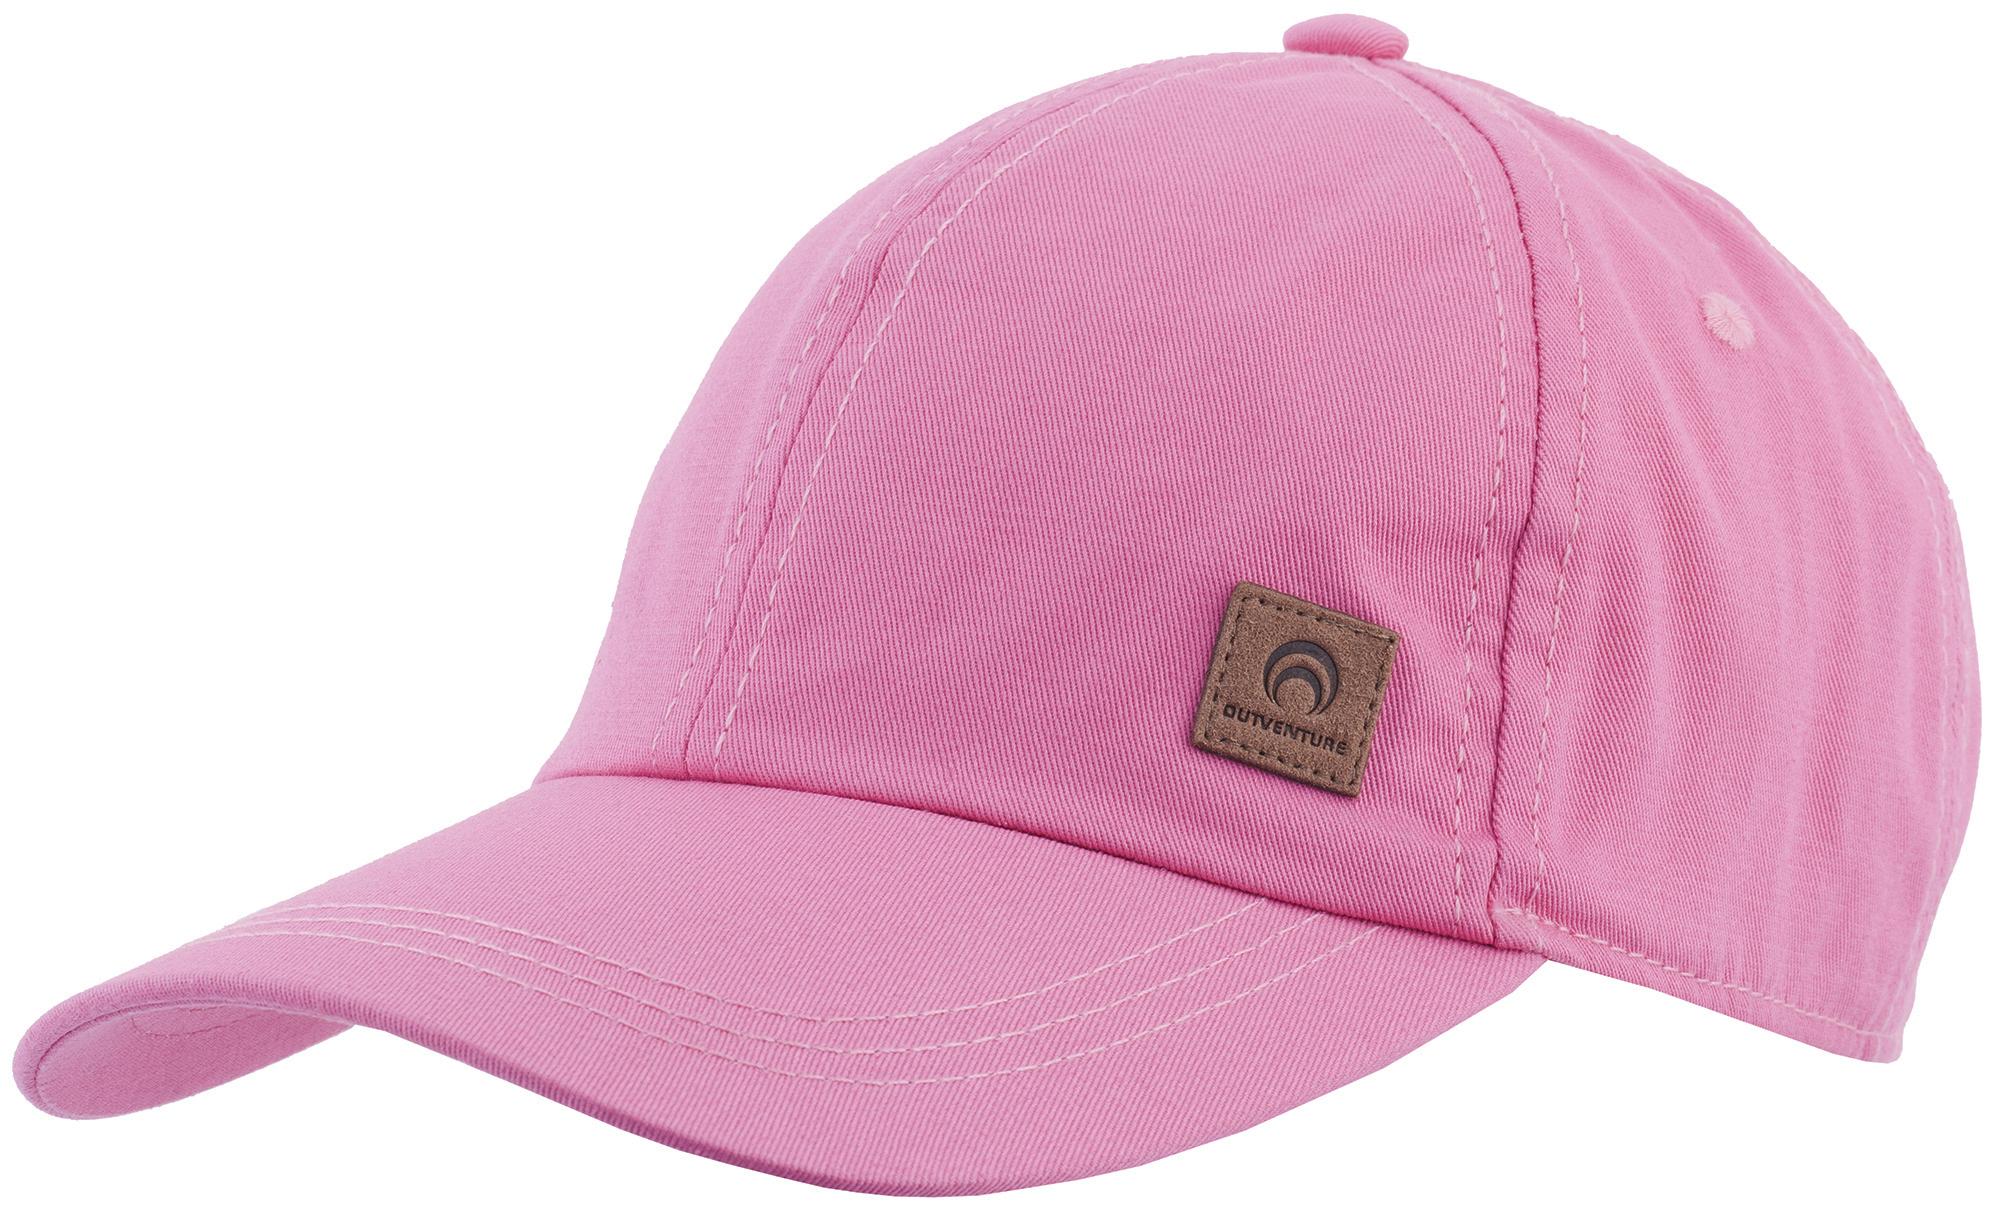 Outventure Бейсболка Outventure шляпы на весну для женщин